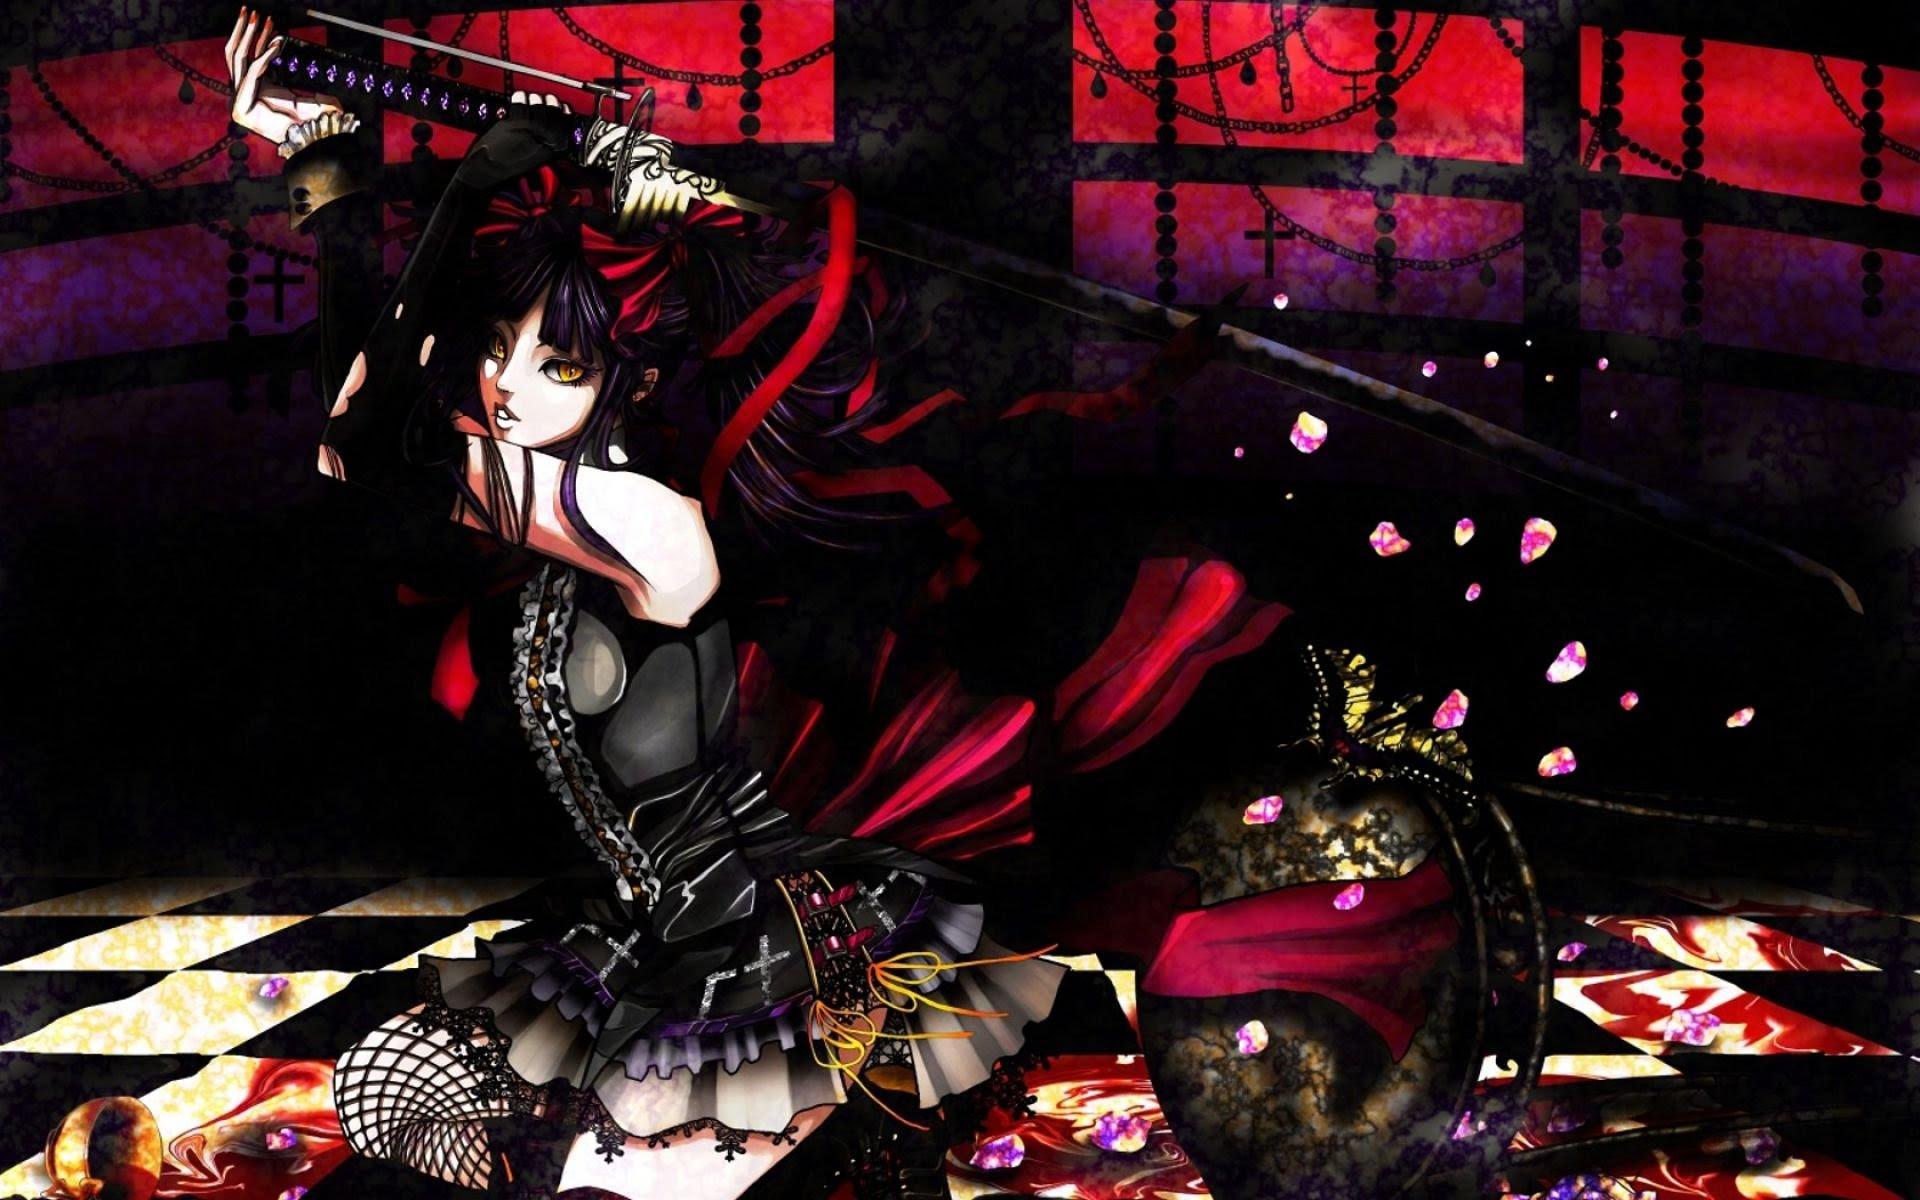 HD Gothic Anime Wallpapers | PixelsTalk.Net